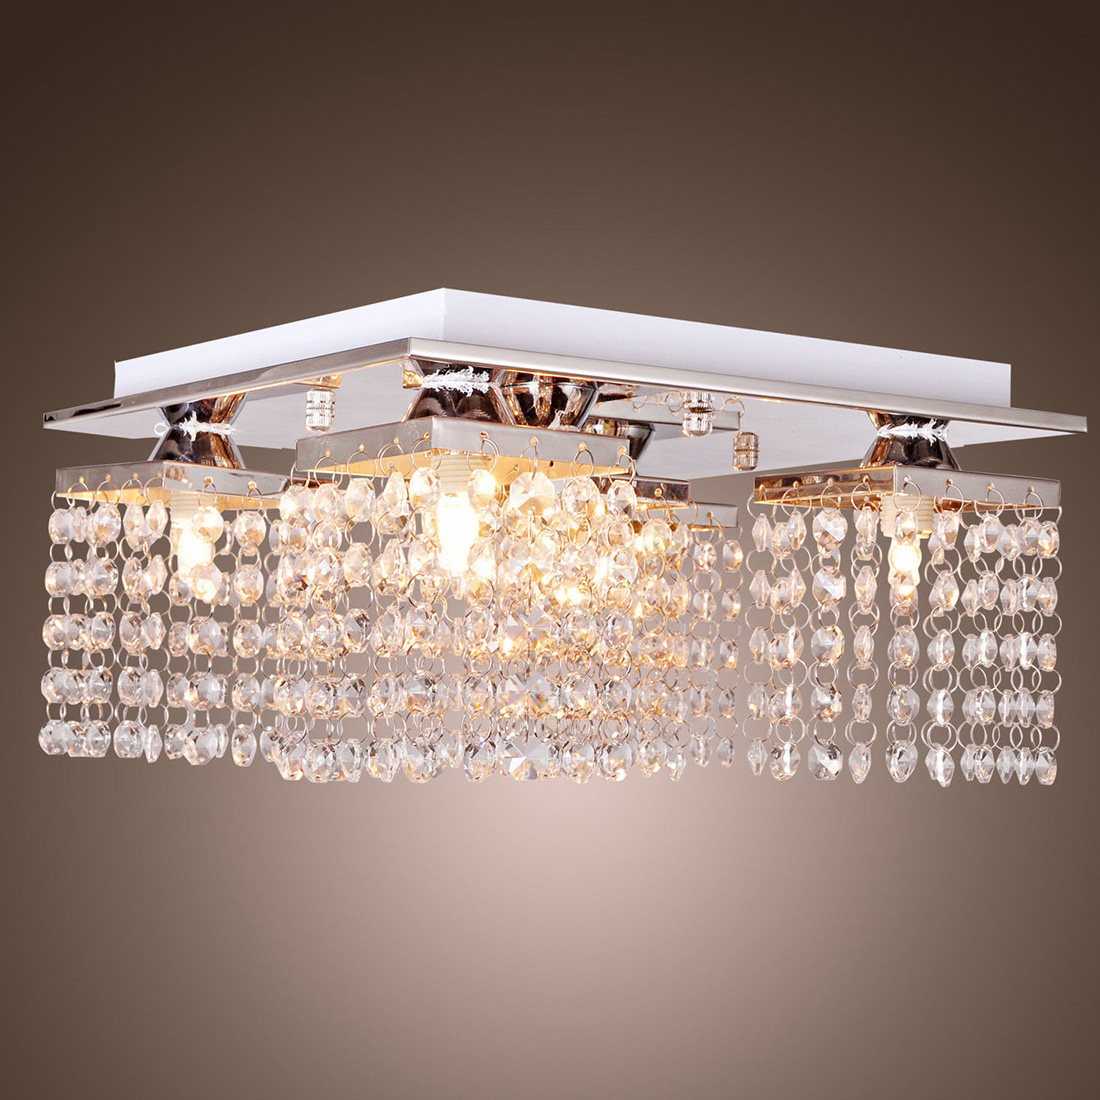 NFLC-Crystal Chandelier Ceiling Light Lamp Pendant Fixture Flush Mount Square<br><br>Aliexpress